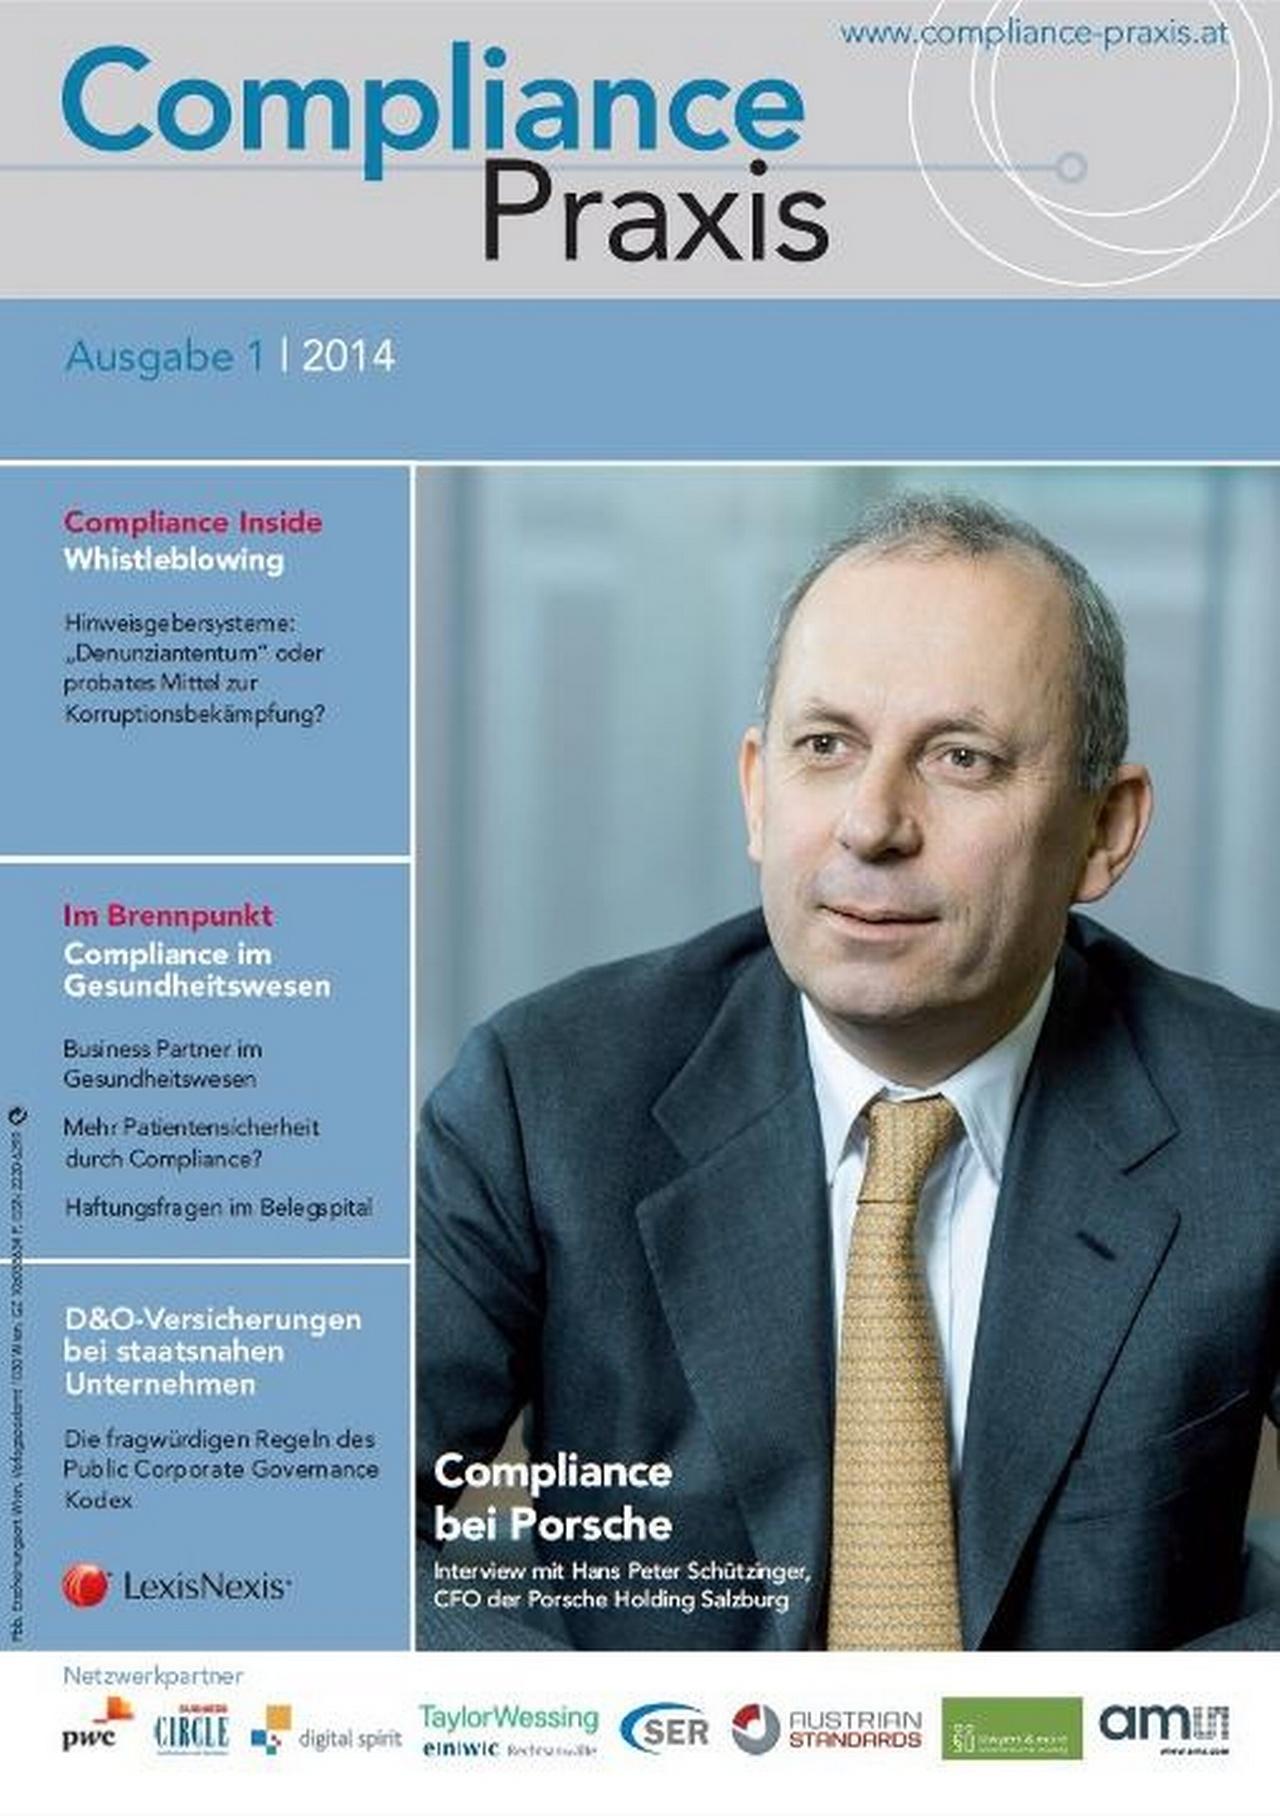 Cover von Compliance Praxis Ausgabe 1/2014, © LexisNexis